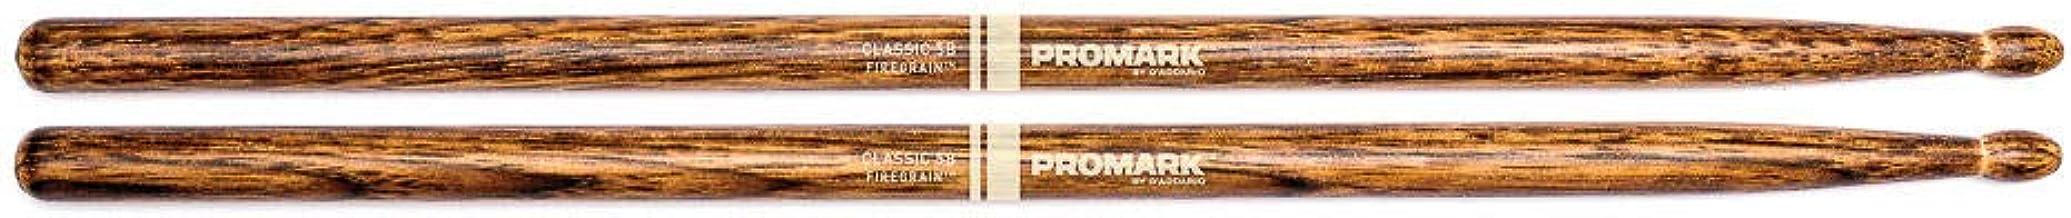 PROMARK プロマーク ドラムスティック FIREGRAIN Classic 5B TX5BW-FG (406 x 15.0mm) 【国内正規品】